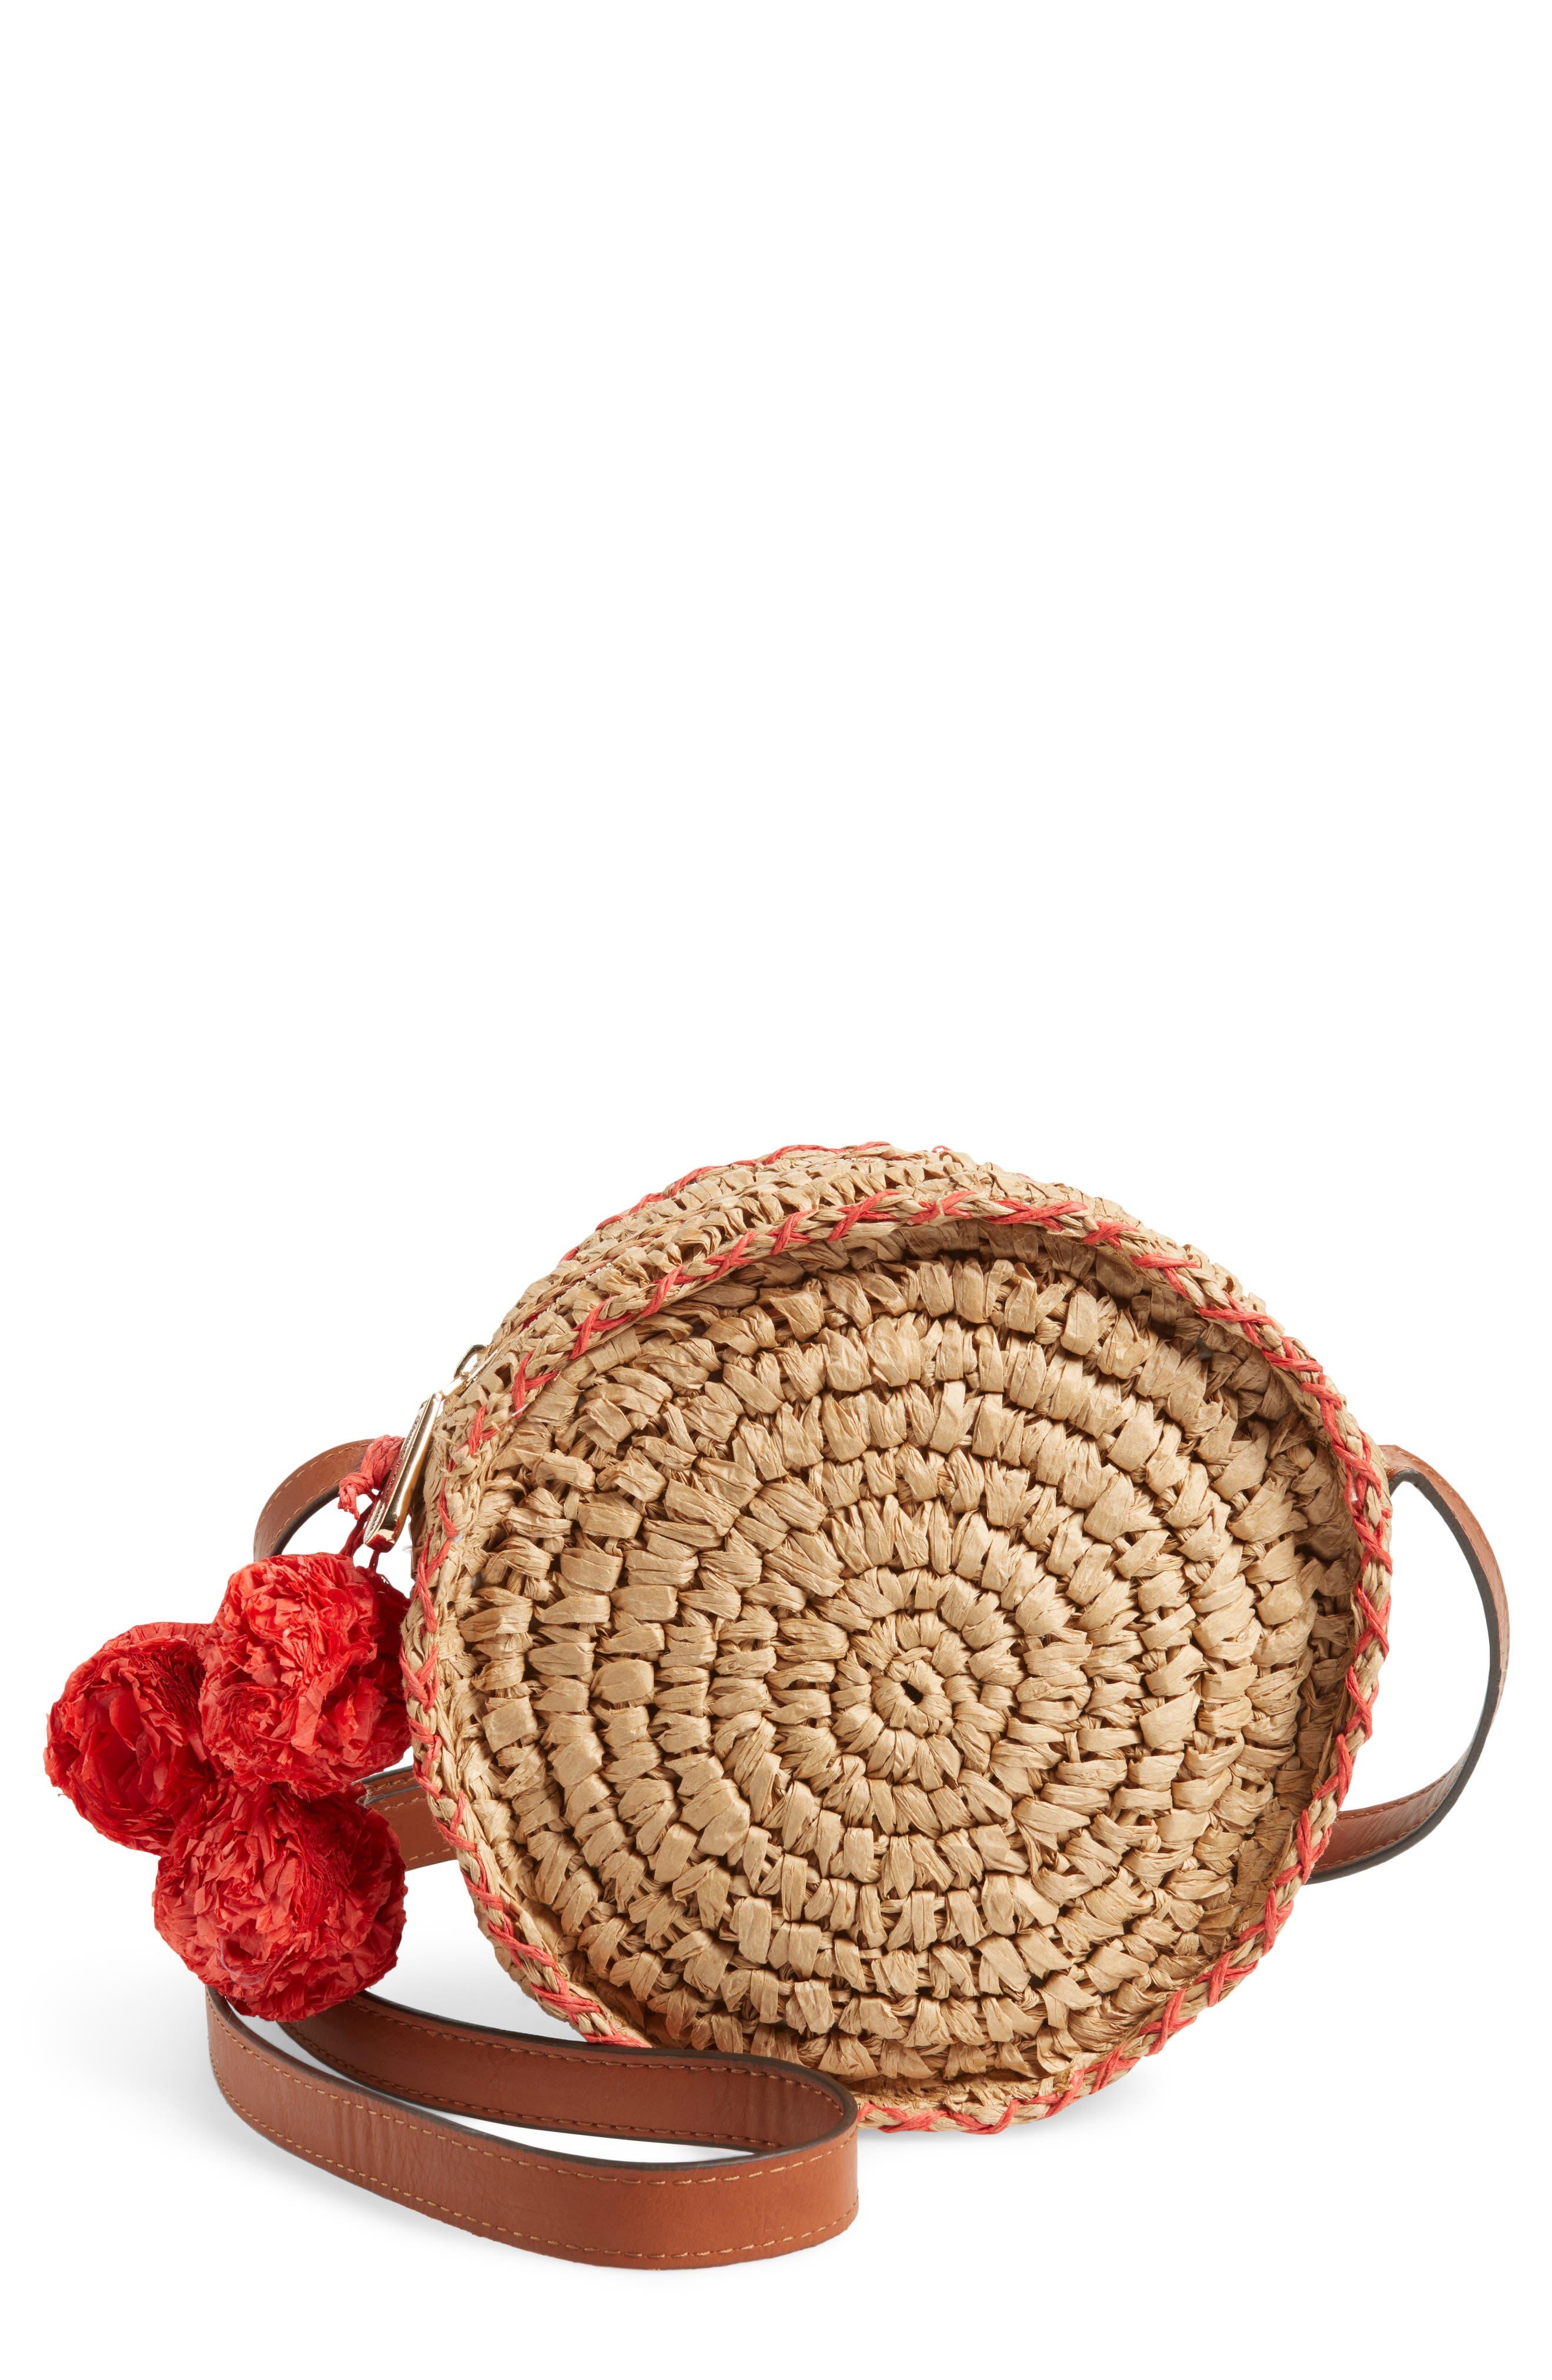 Pirro Woven Straw Crossbody Bag,                             Main thumbnail 1, color,                             237